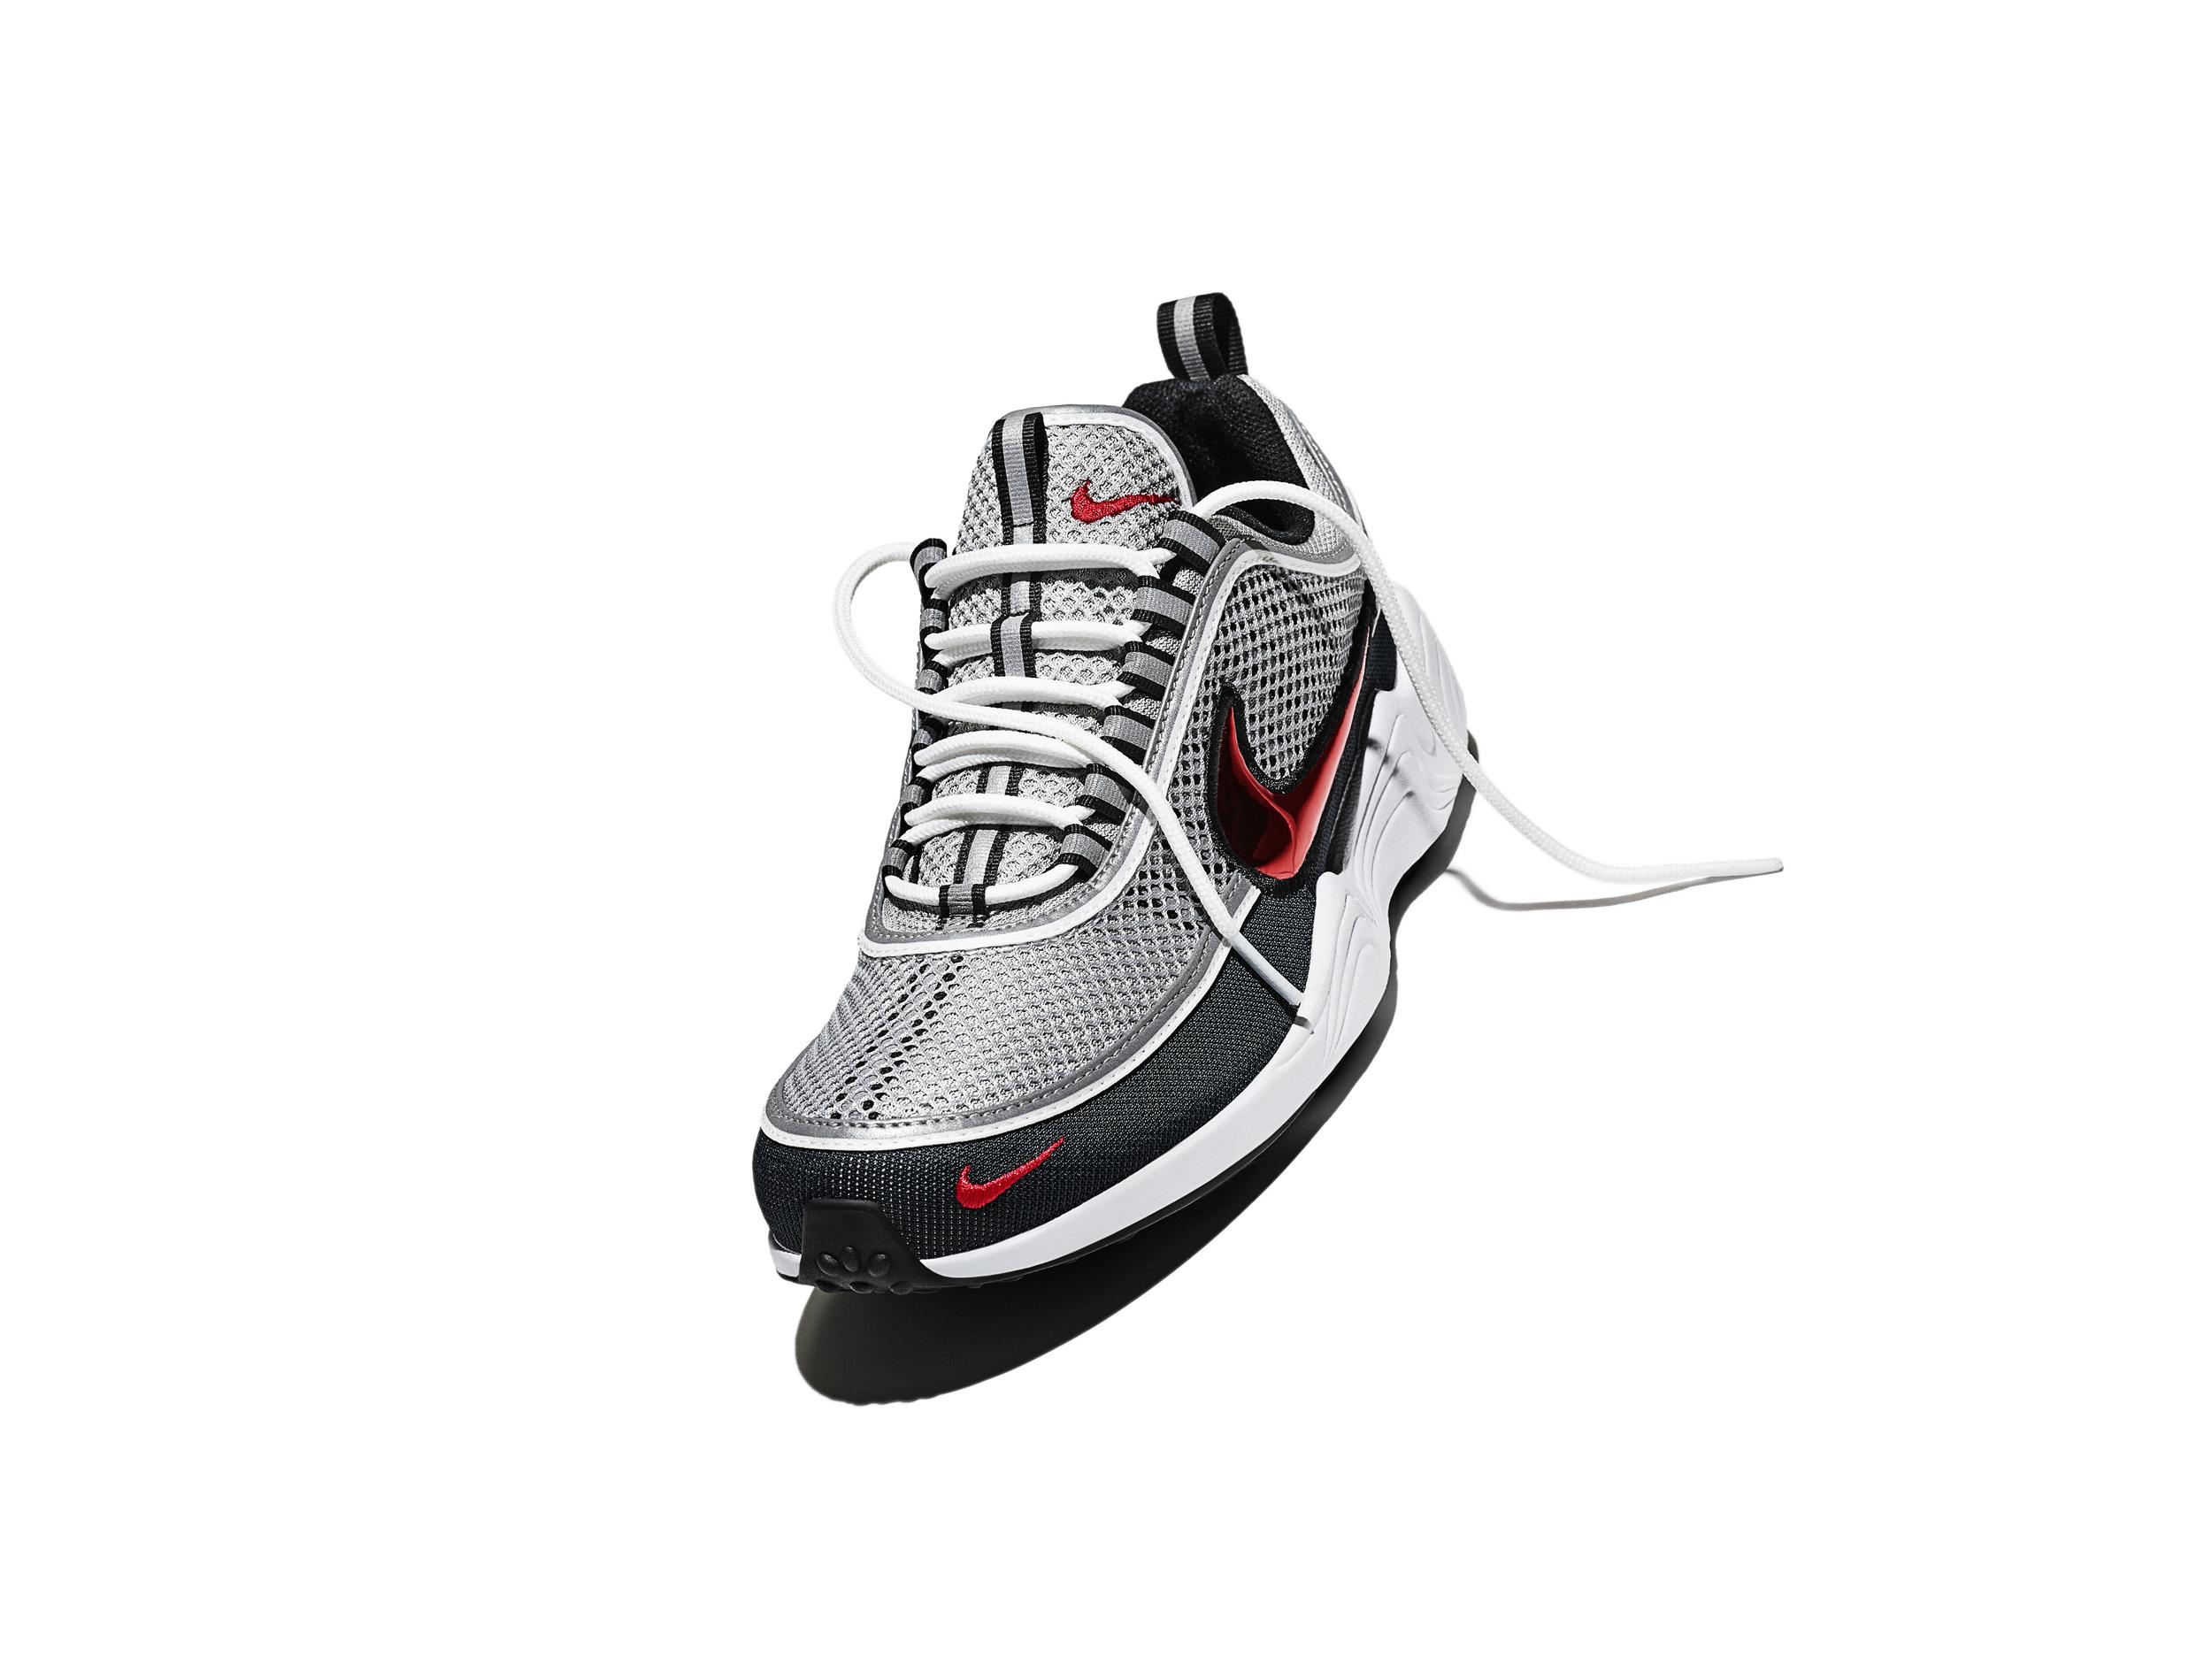 Nike_LAB_Spiridon_slvred_HERO_03_60178.jpg